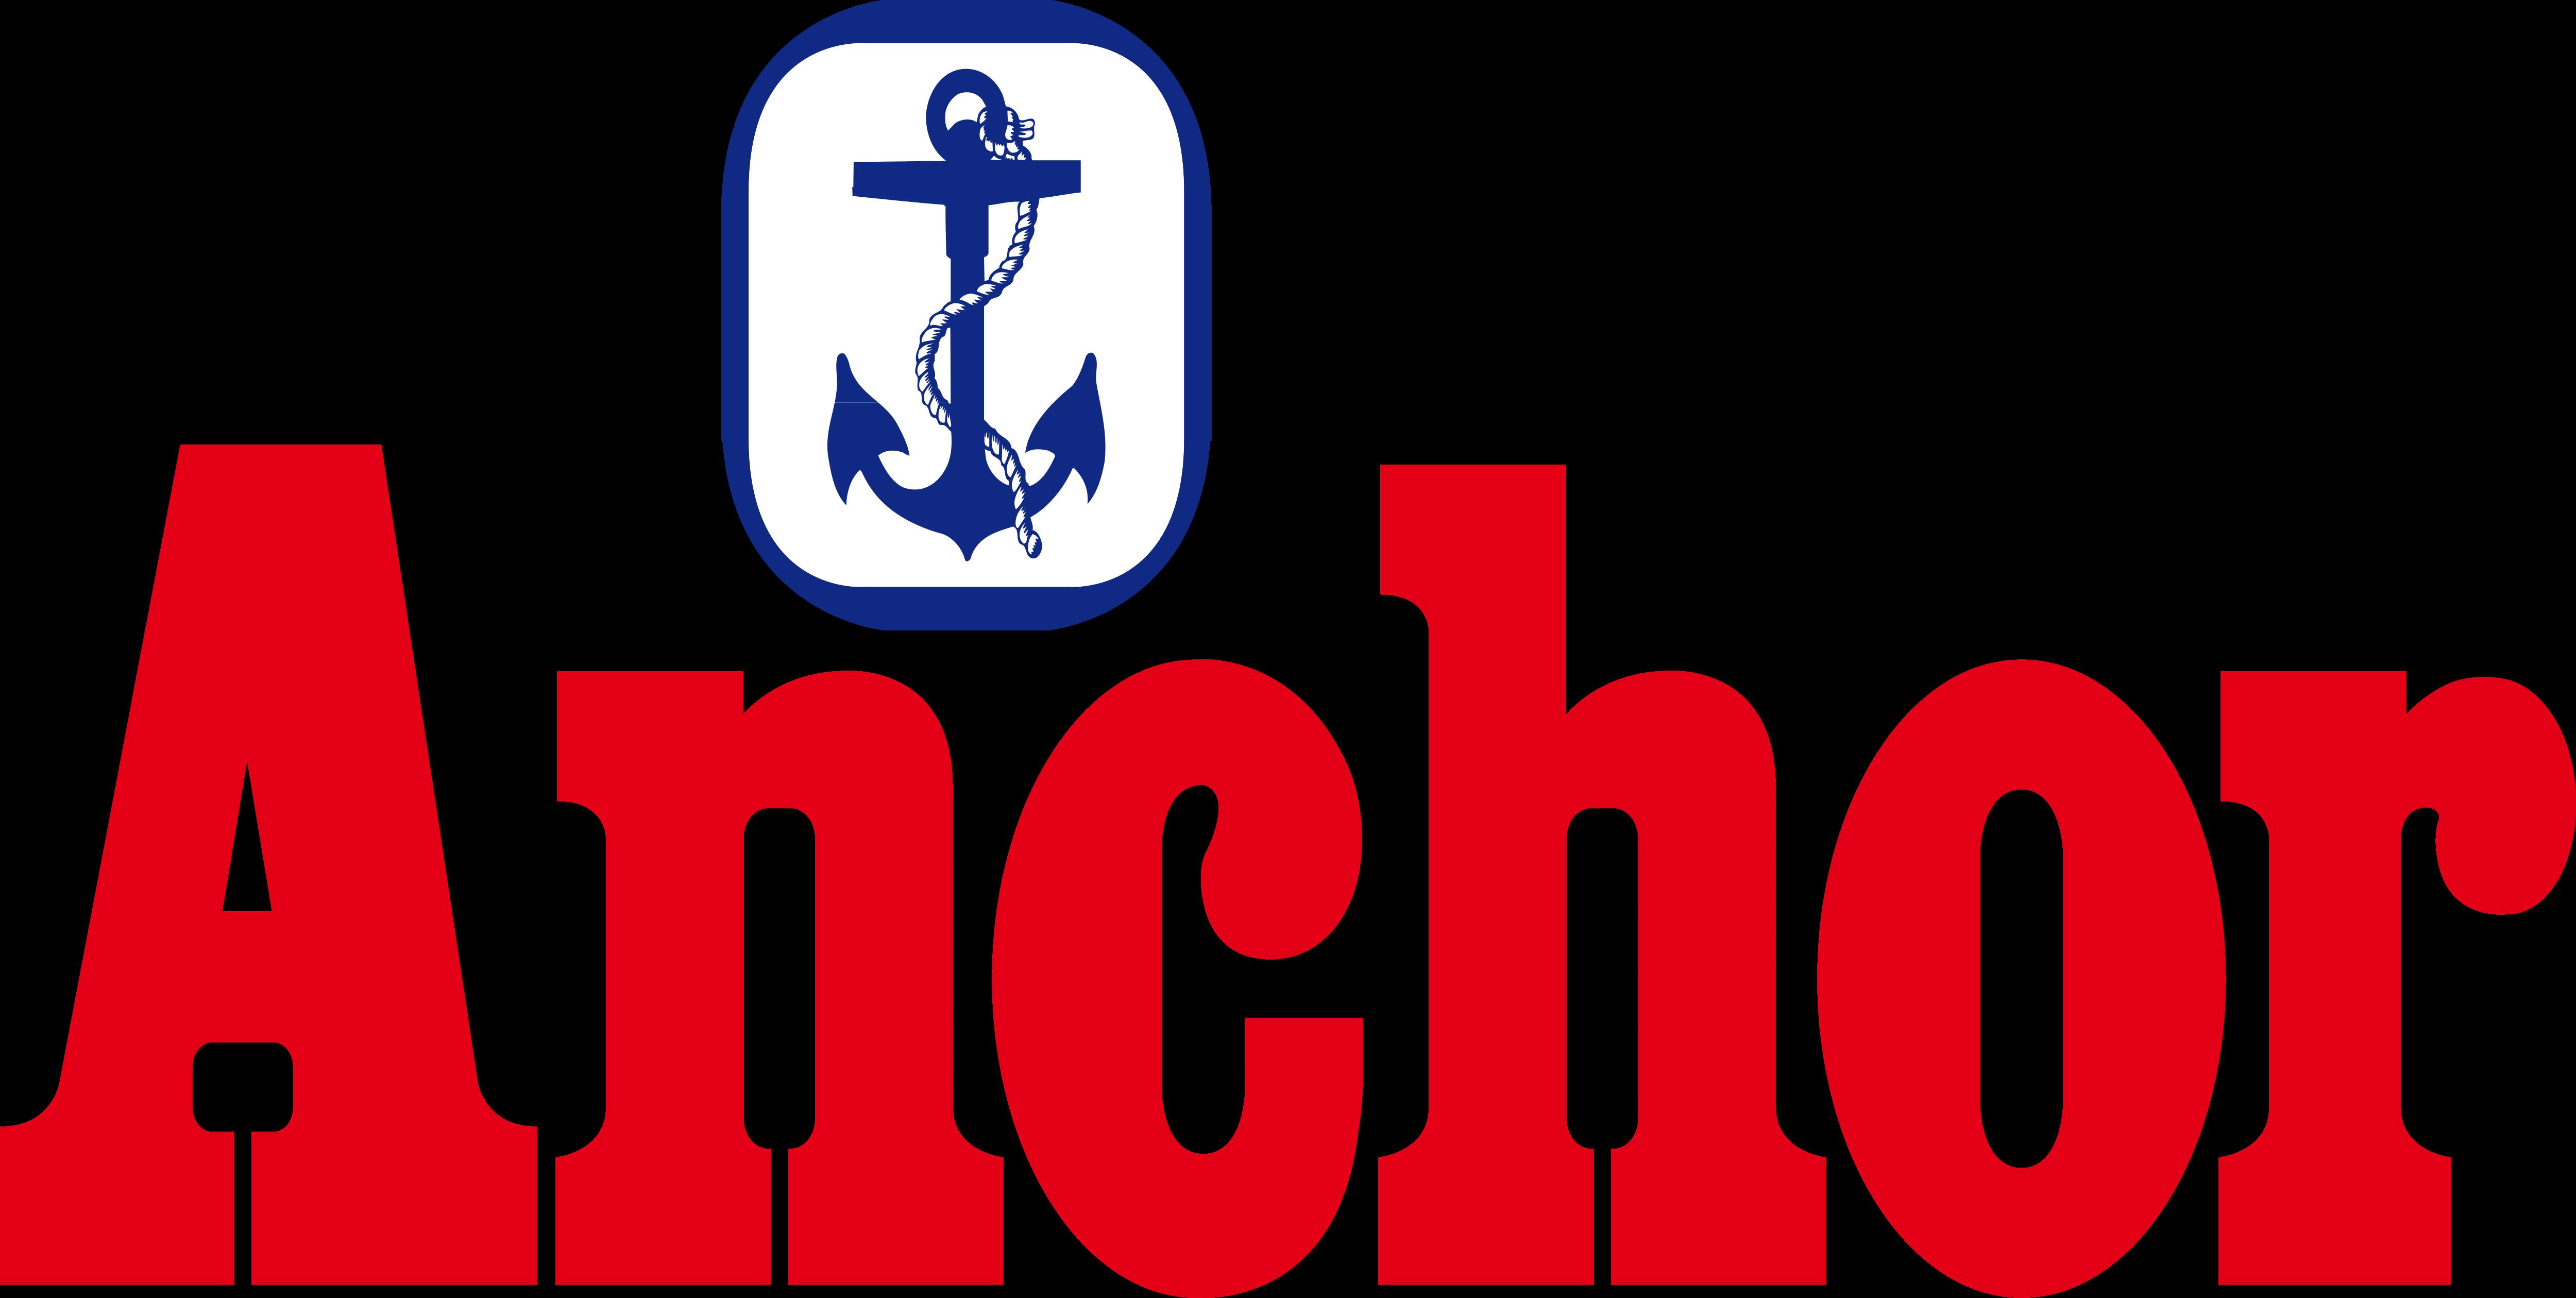 Anchor Light Cheddar.